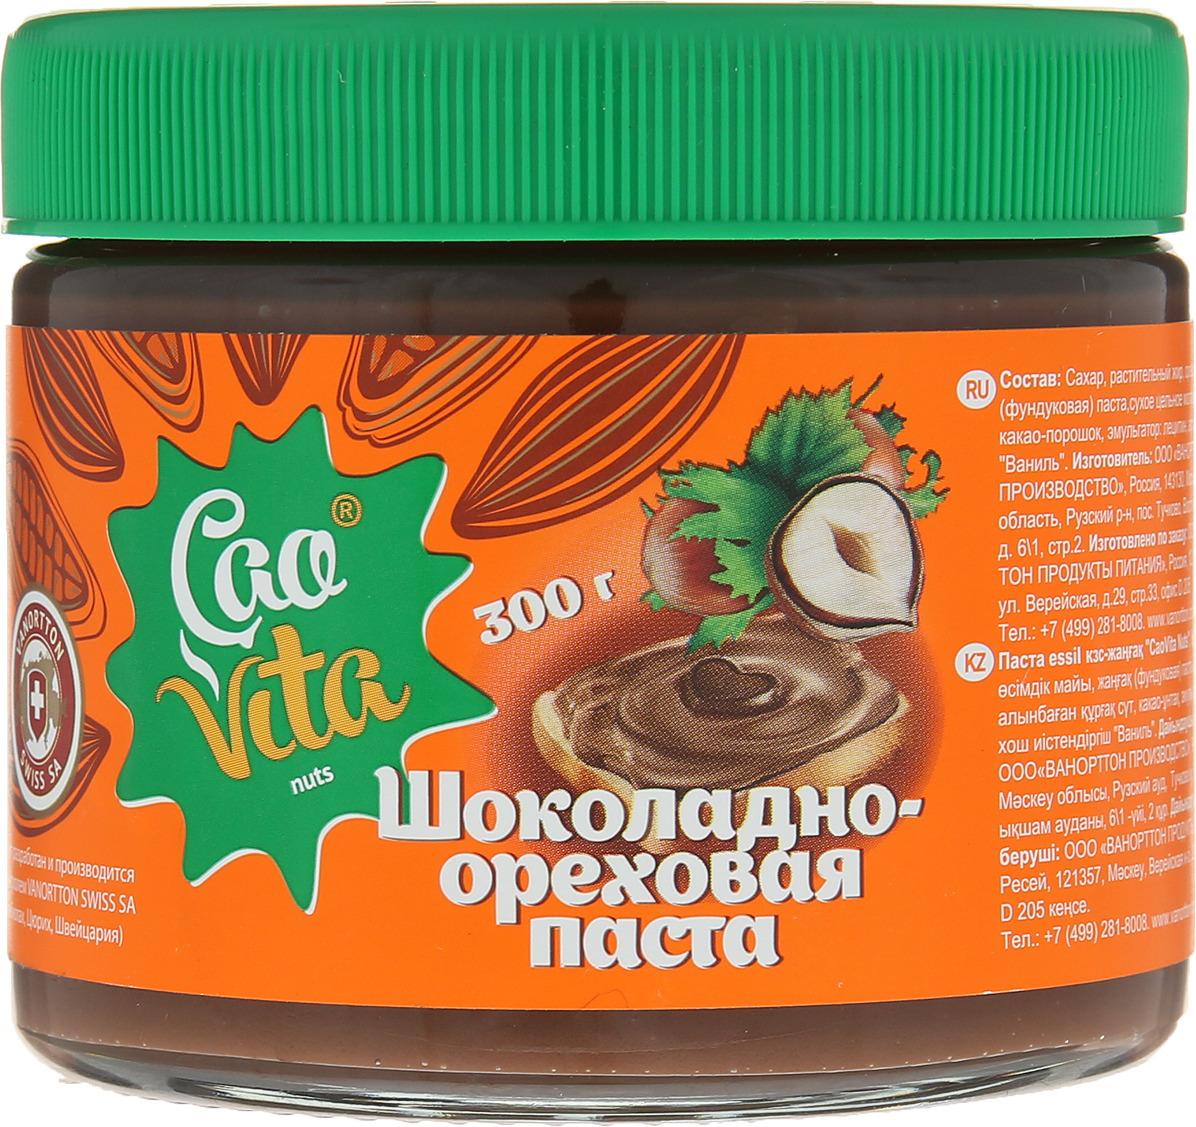 CaoVita Nuts Паста шоколадно-ореховая, 300 г